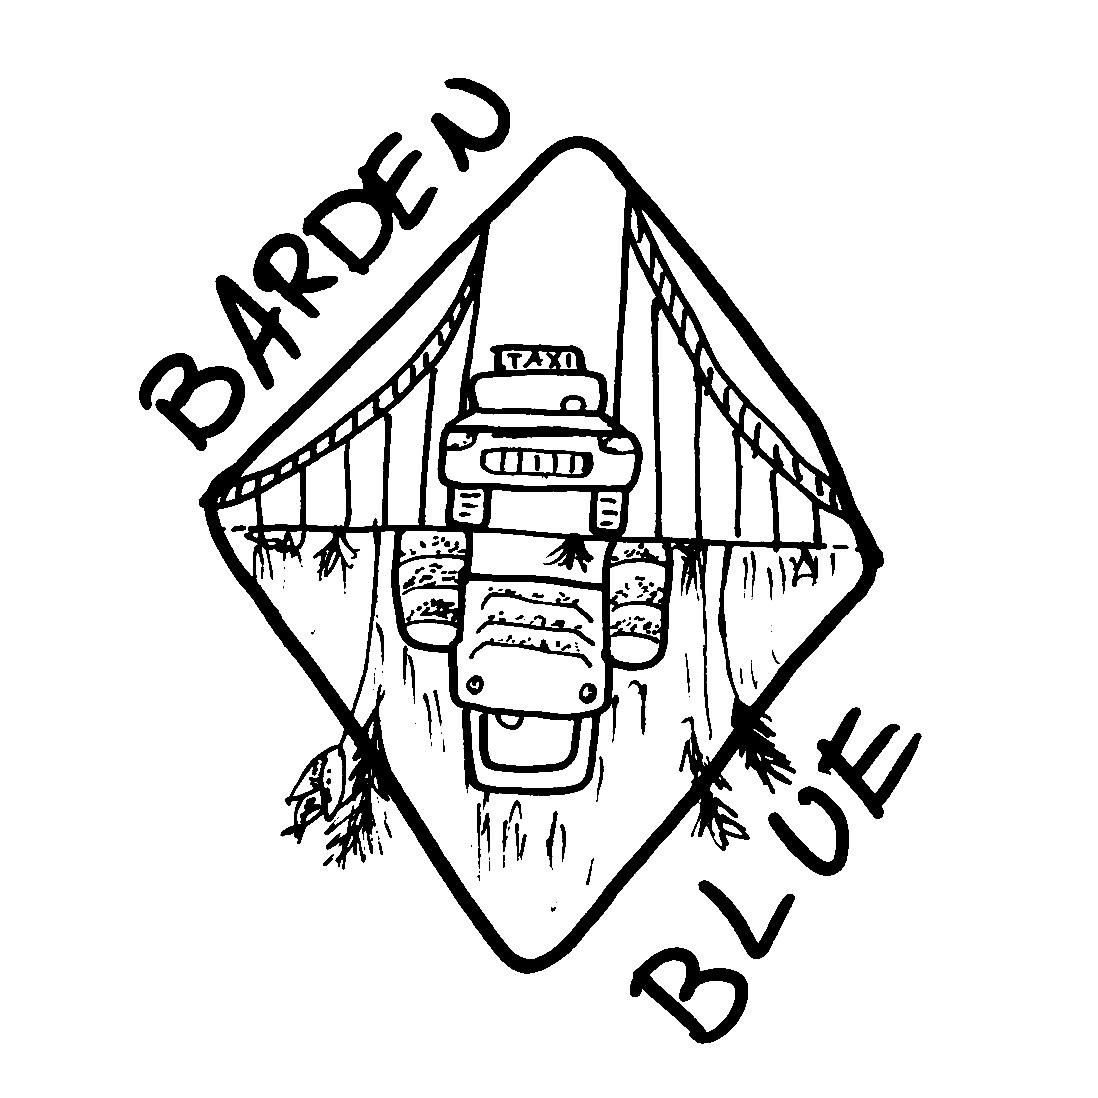 BardenBlue-sketch-portfolio.jpg